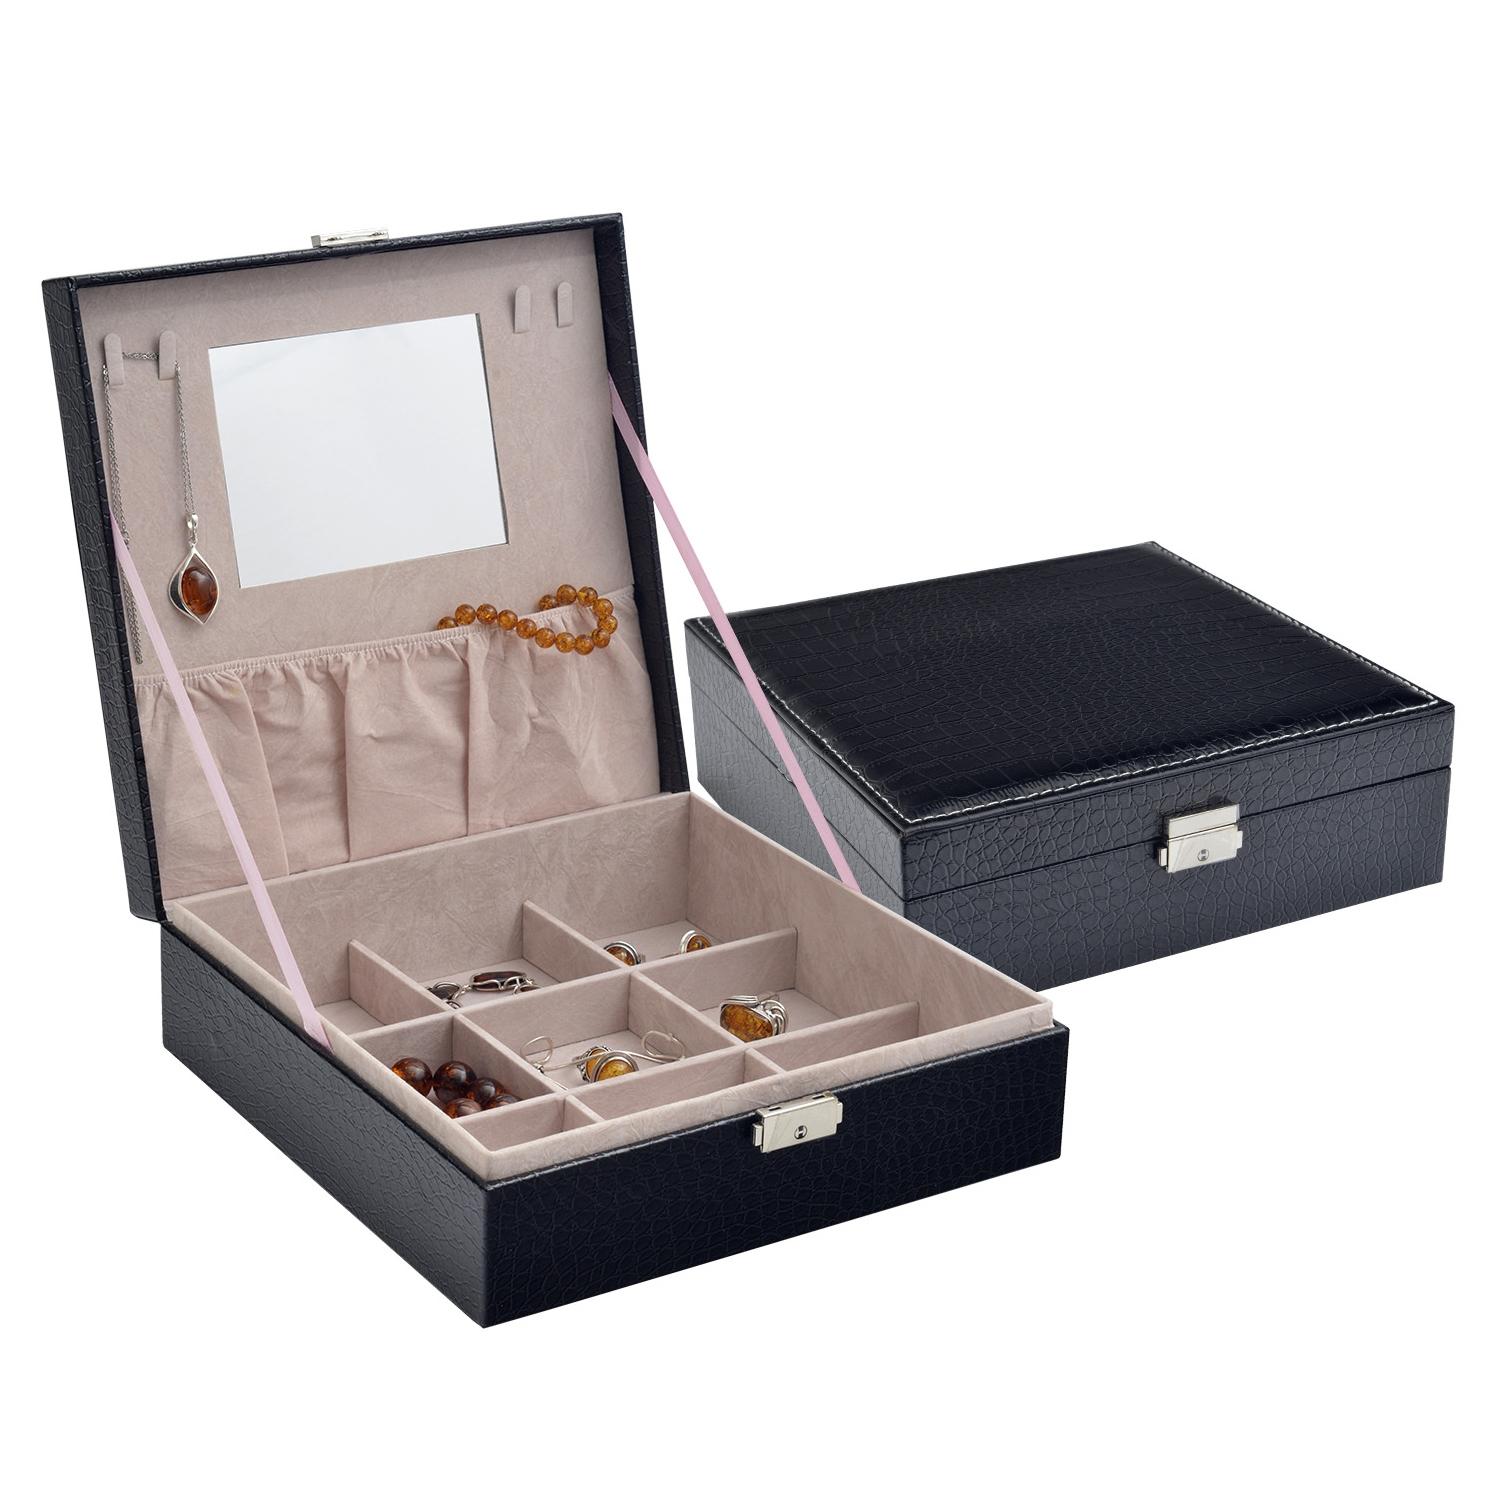 Černá koženková šperkovnice SVK1165-BK